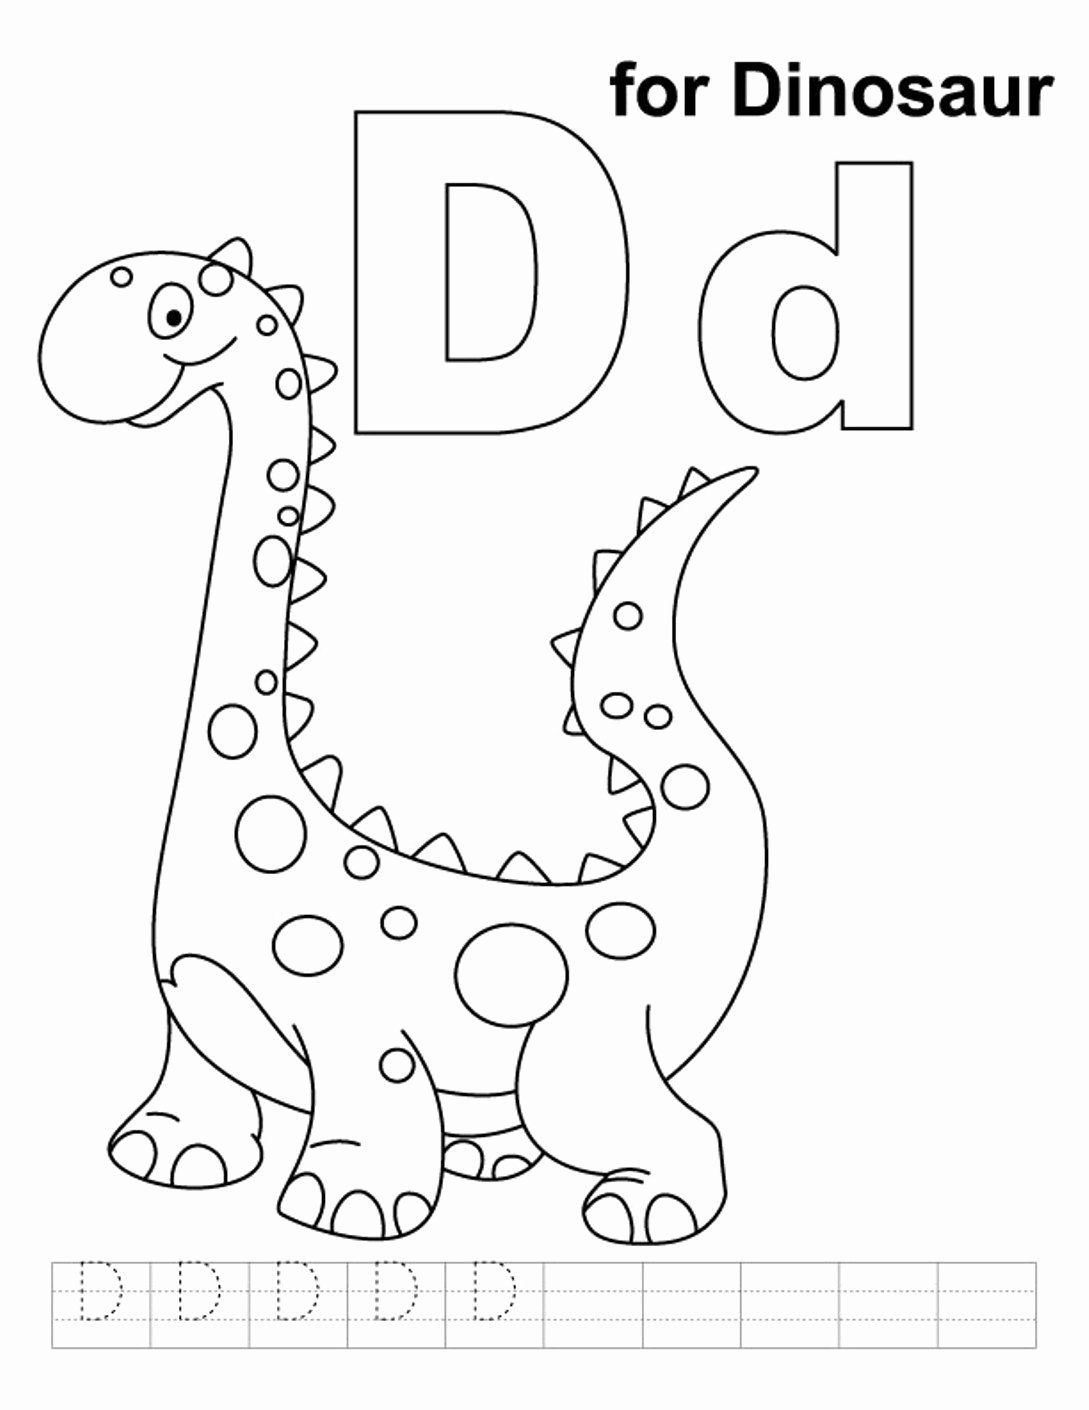 hight resolution of Alphabet Coloring Worksheets for 3 Year Olds Elegant Dinosaur Printable  Alphabet Coloring Pages – Color… in 2020   Dinosaur coloring pages